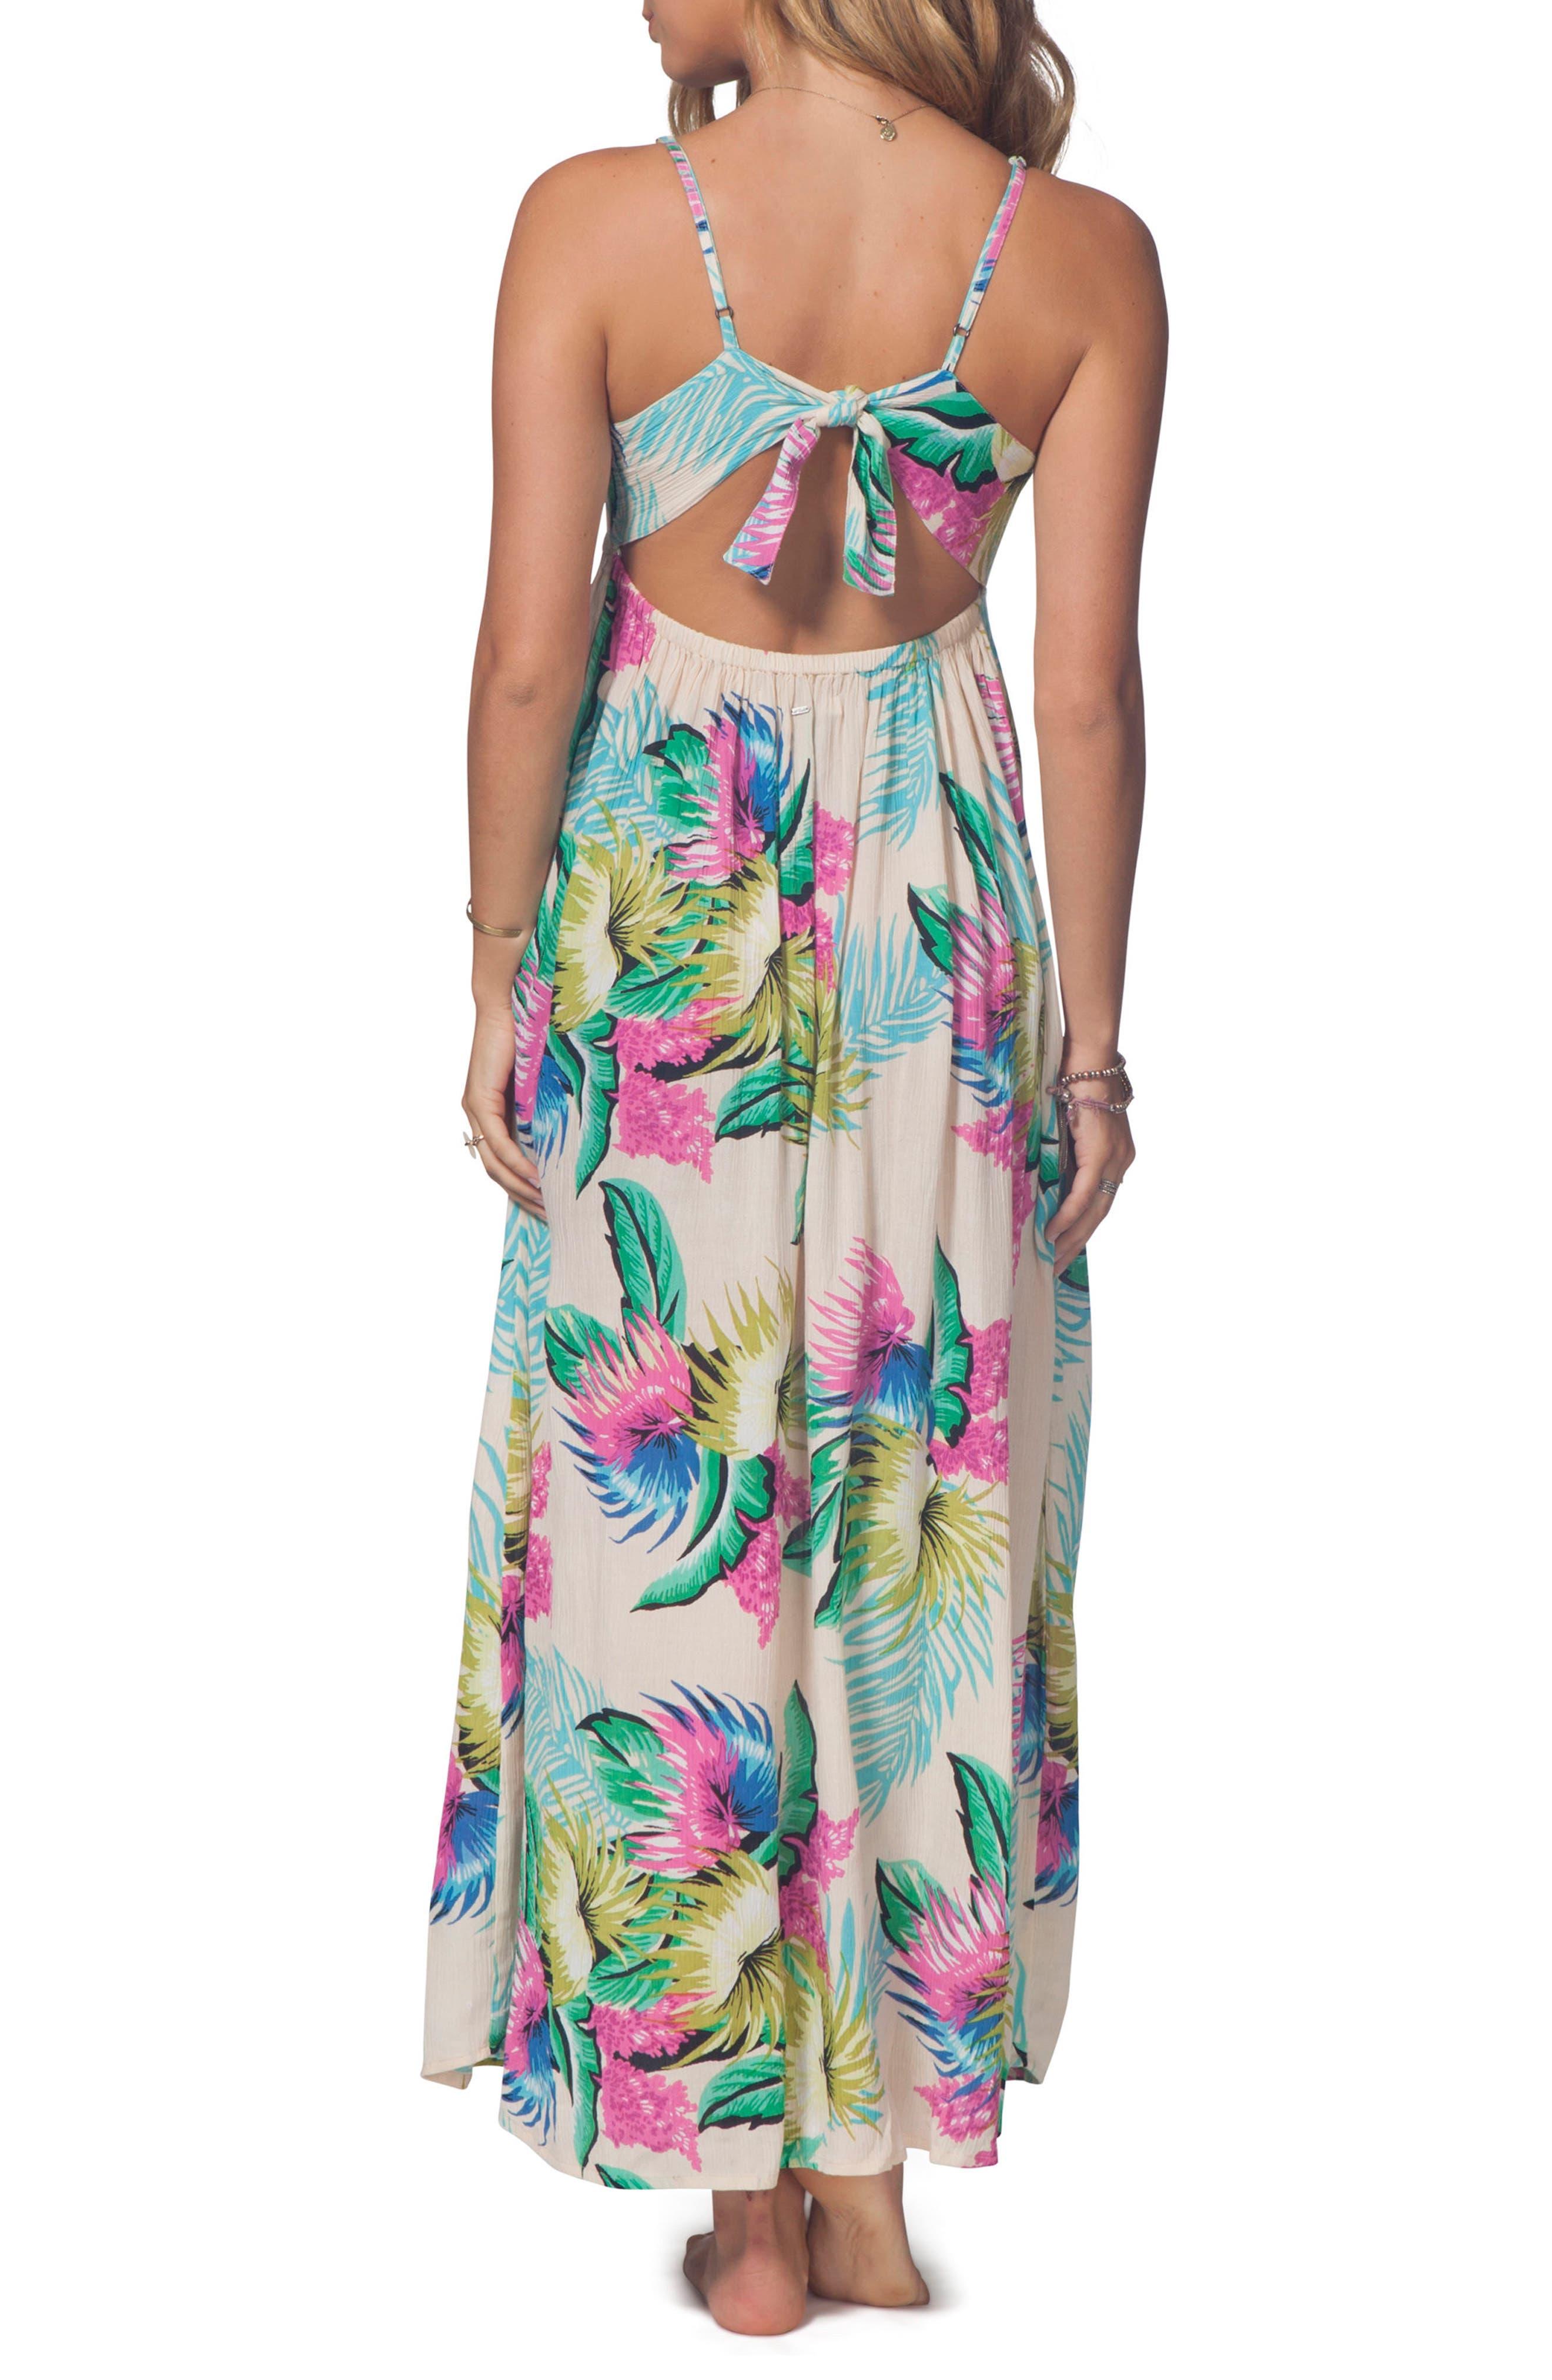 Ophelia Maxi Dress,                             Alternate thumbnail 2, color,                             901